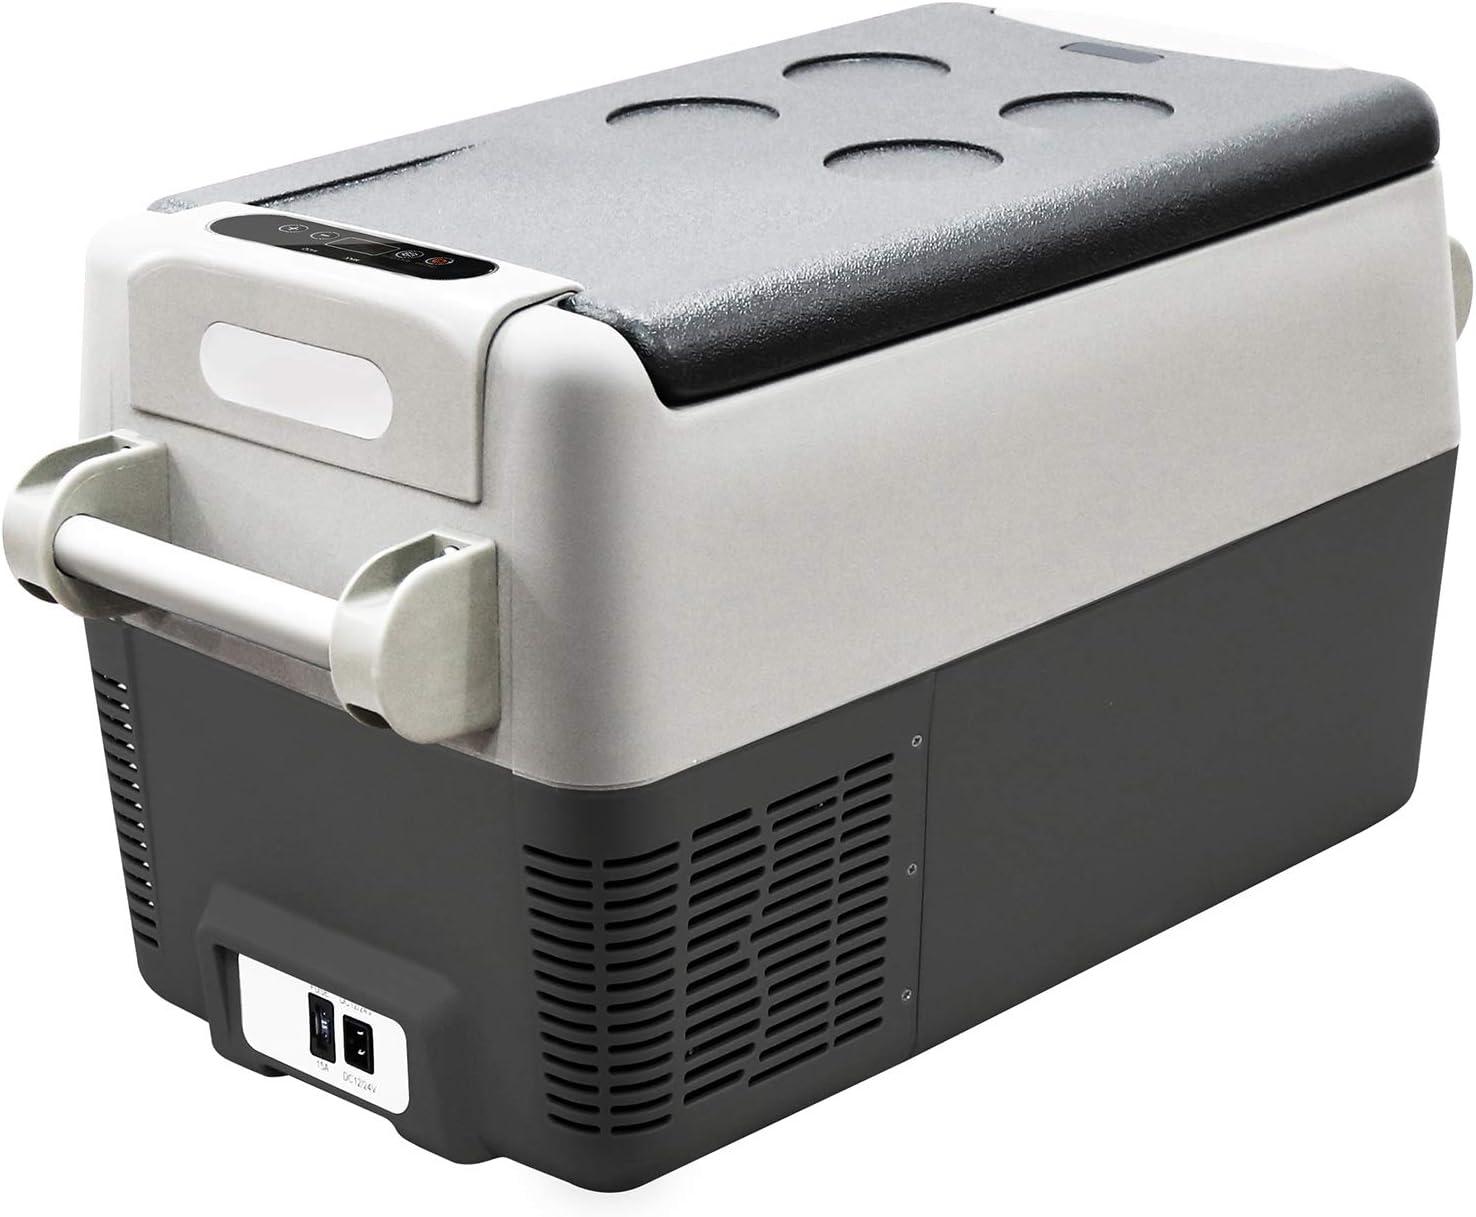 Portable Refrigerator 12V Car Freezer, 30 Liter Truck Refrigerator, Home and Car Use, Electric Powered 12V/110V, 2-YEAR Warranty on the Compressor